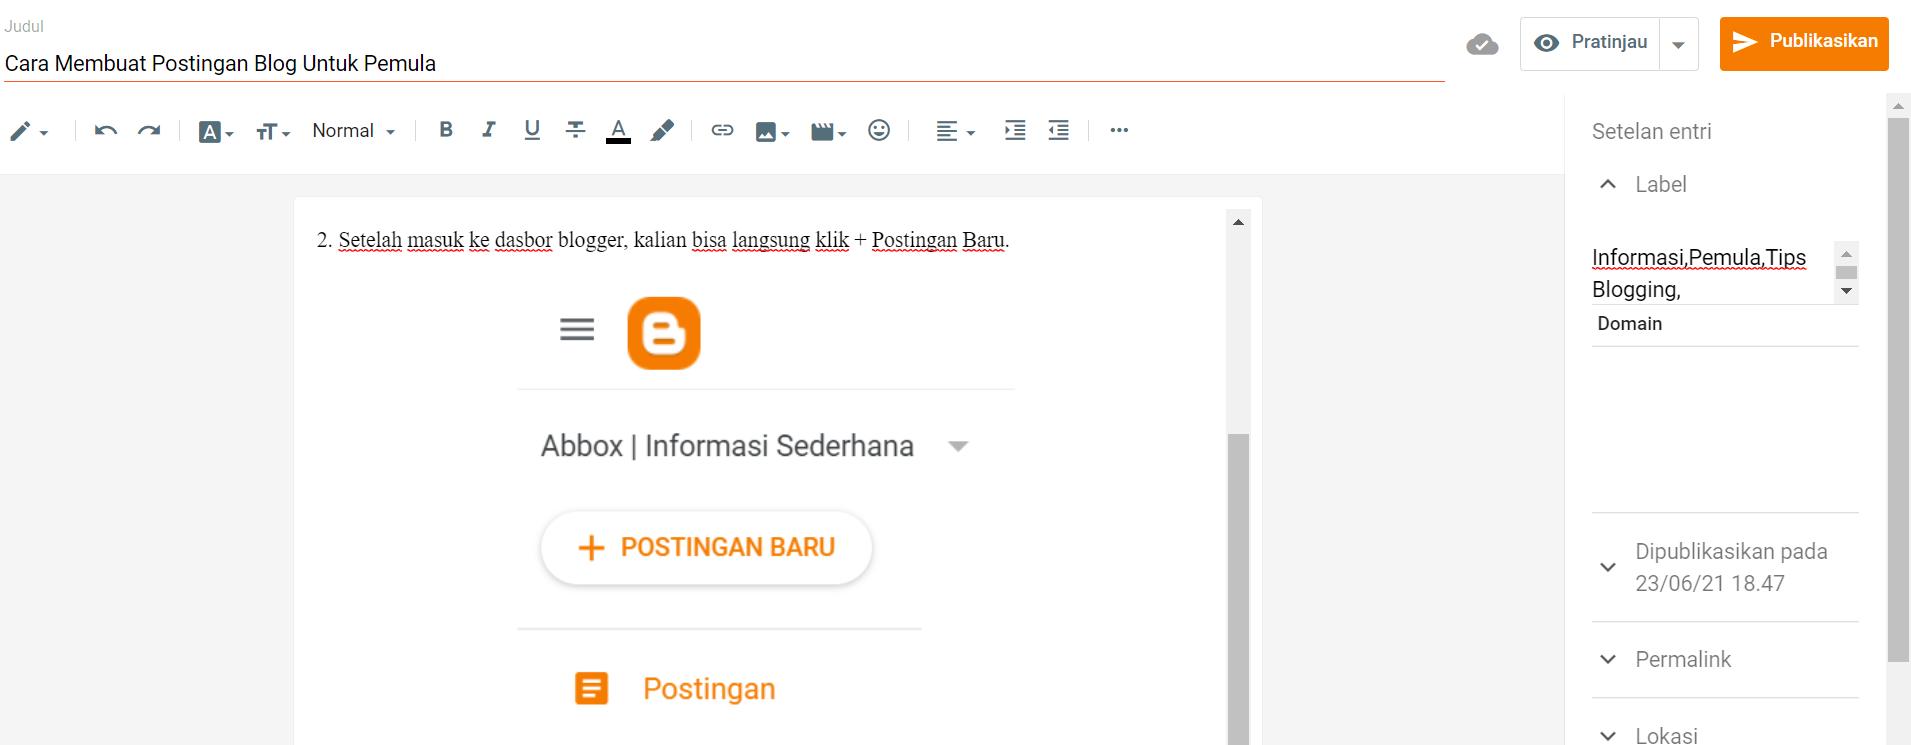 Cara Membuat Postingan Blog Untuk Pemula